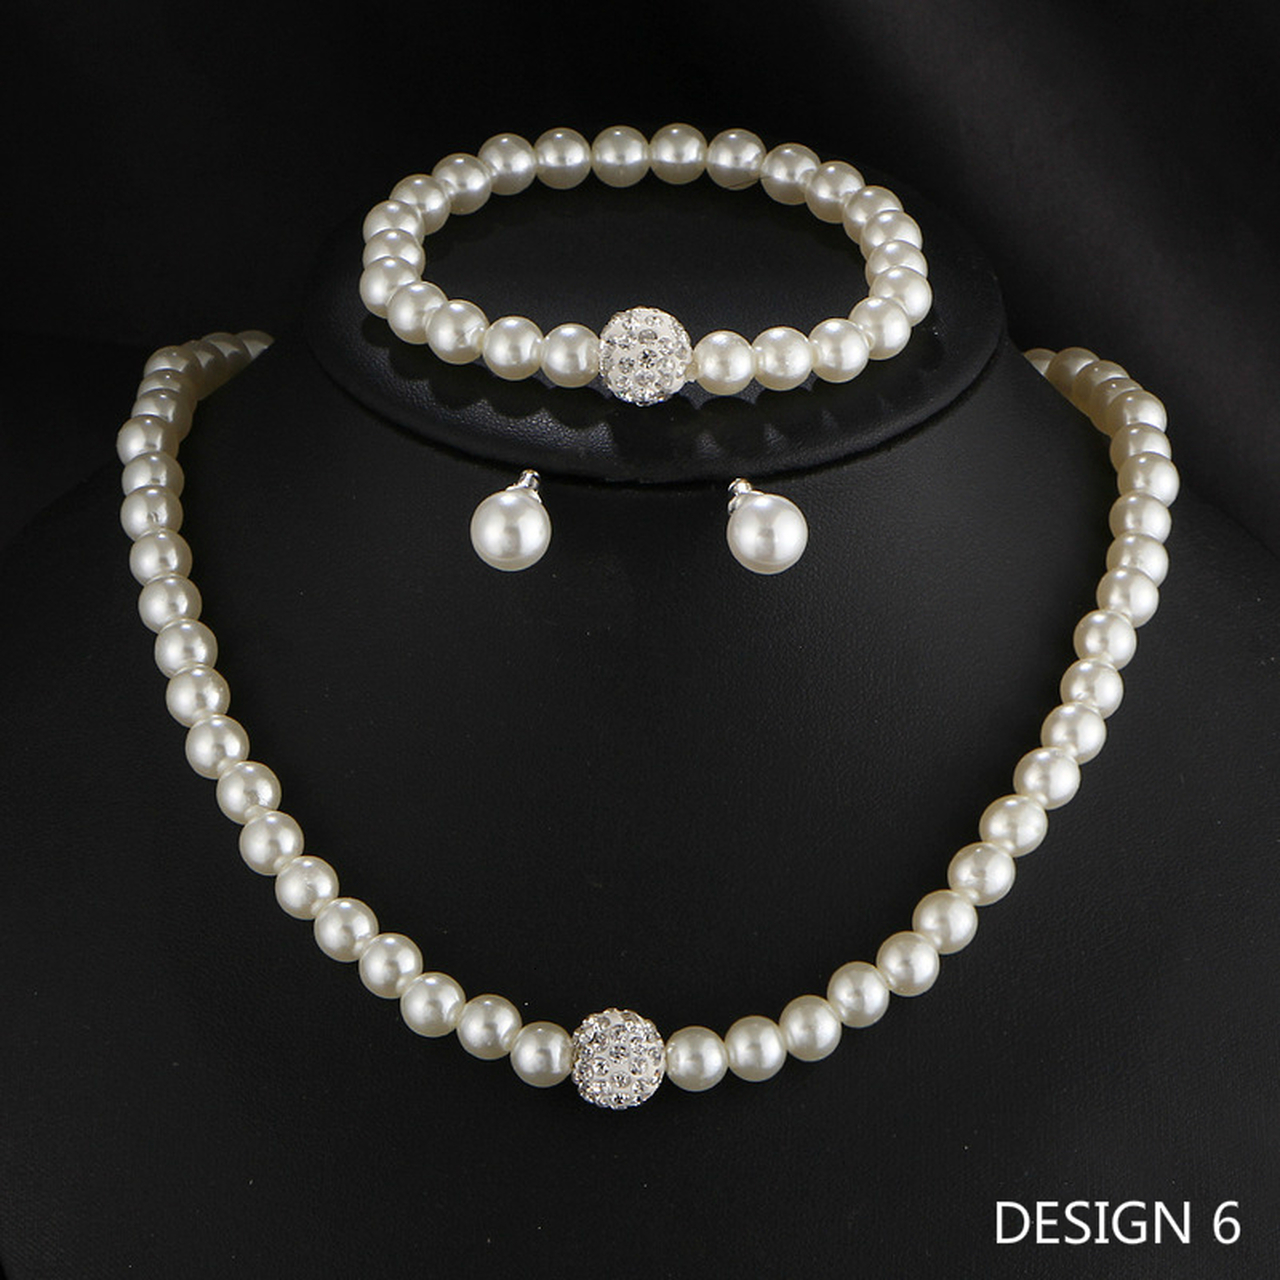 Elegant Crystal Pearl Necklace Earrings Set Women Bridal Wedding Jewellery Gifts